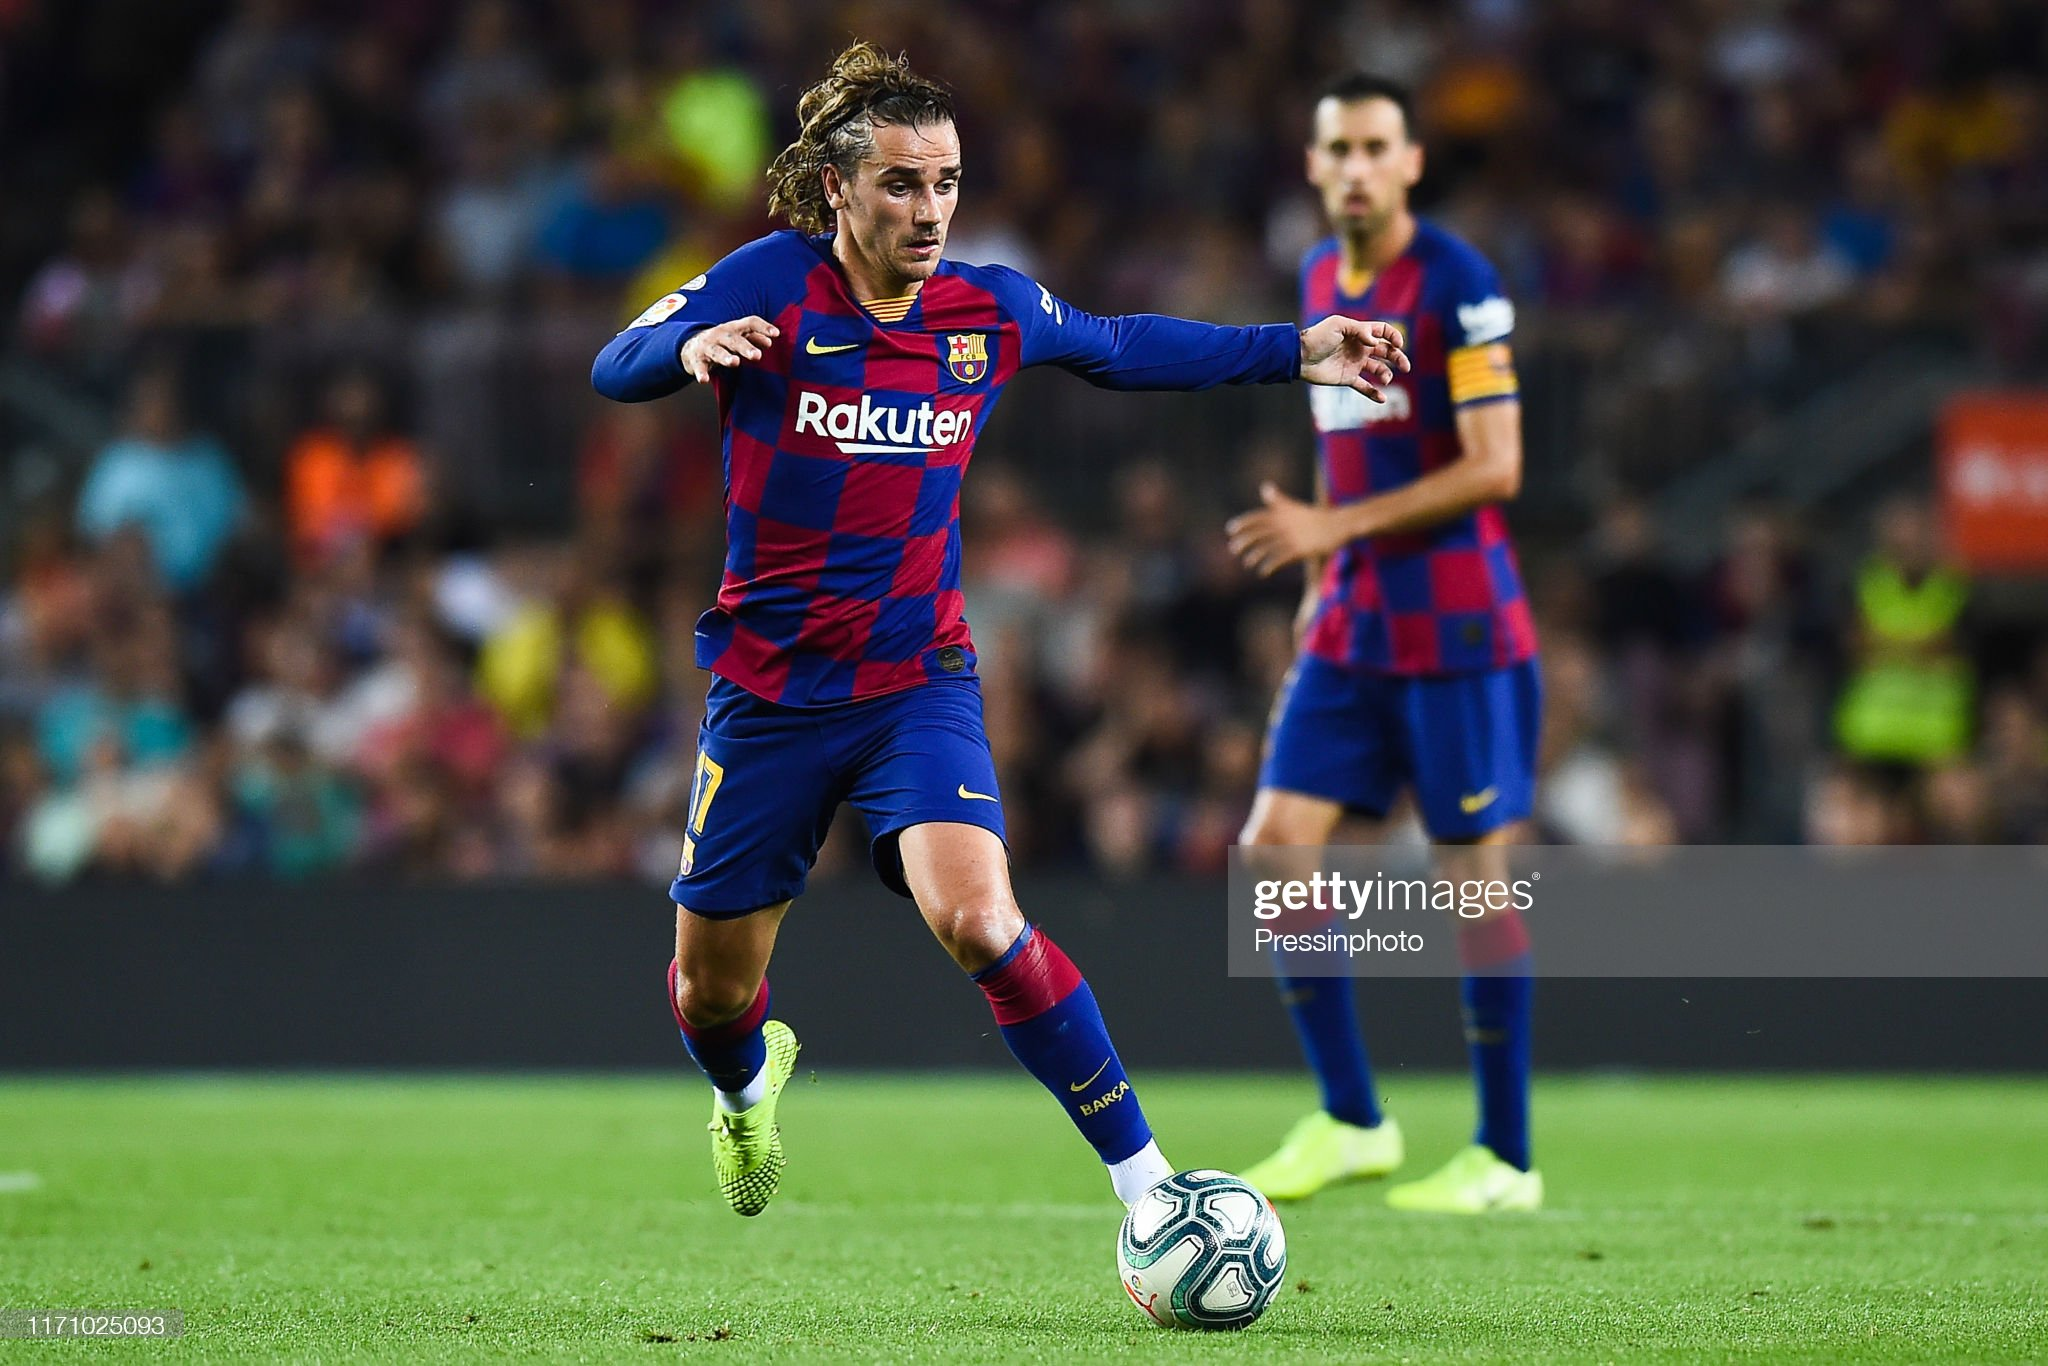 صور مباراة : برشلونة - فياريال 2-1 ( 24-09-2019 )  Antoine-griezmann-of-fc-barcelona-during-the-liga-match-between-and-picture-id1171025093?s=2048x2048